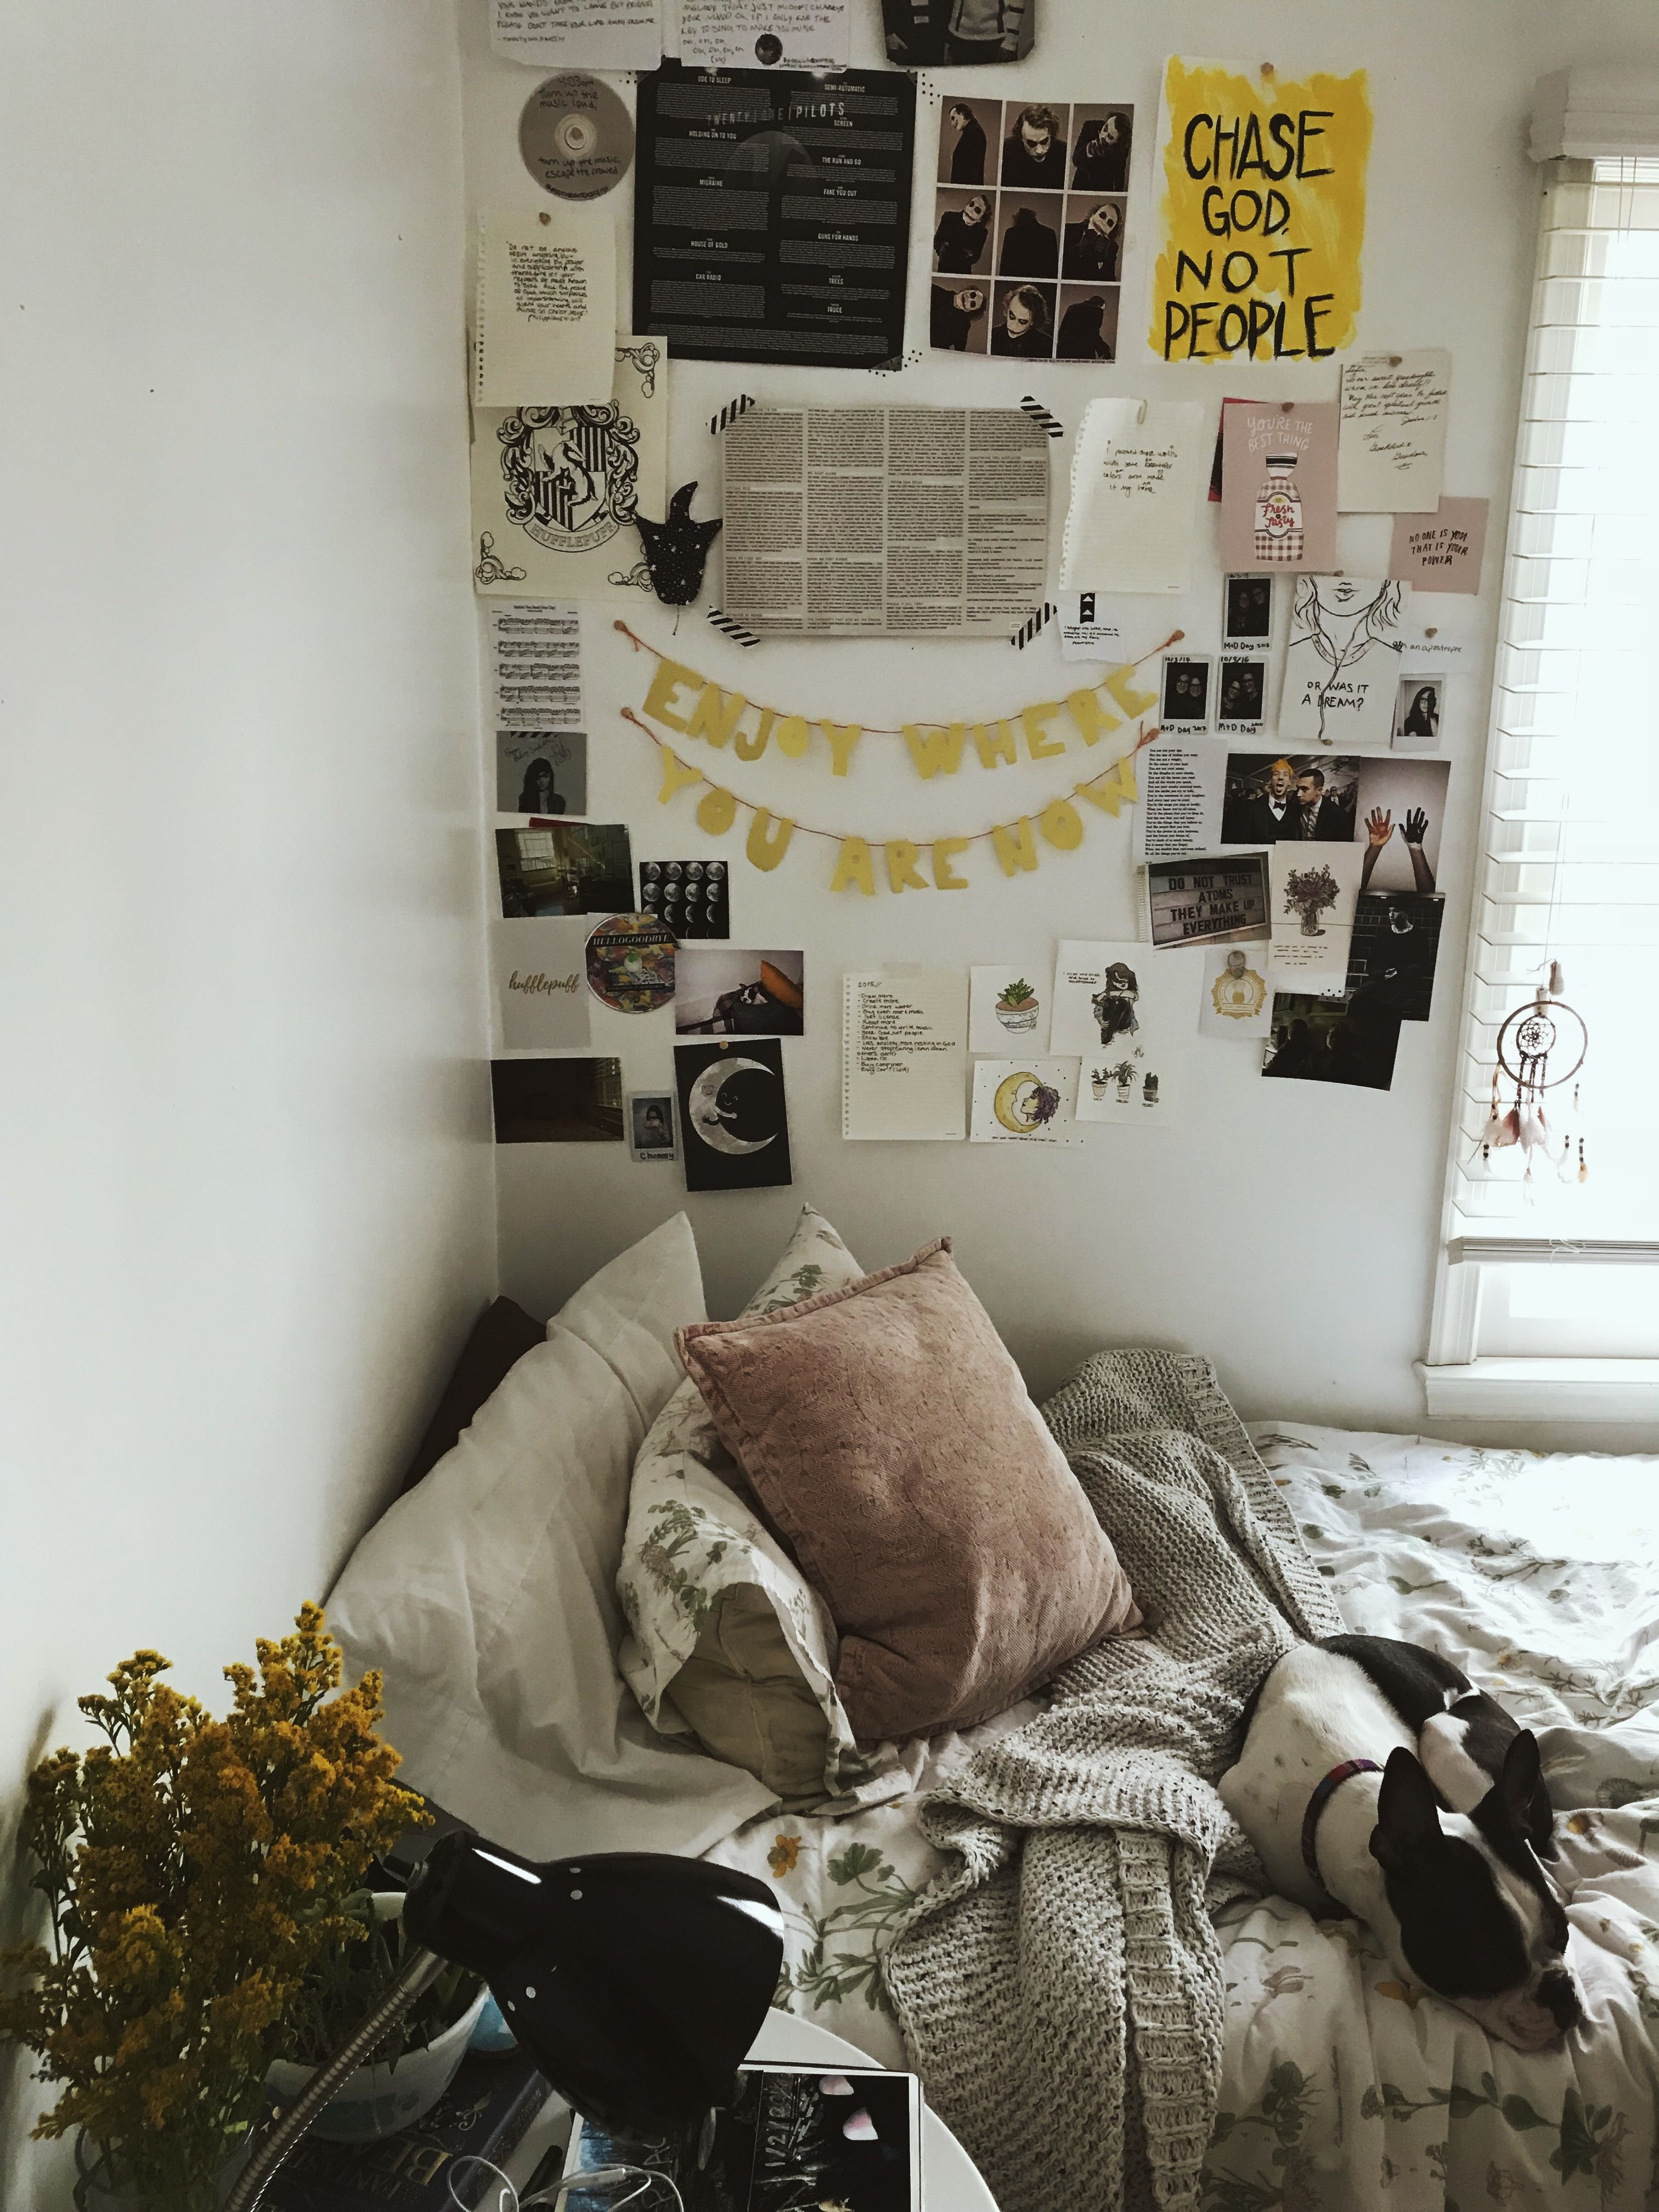 Yellow Aesthetic Bedroom Instagram Blesstheoutcasts Como Decorar Quarto Pequeno Decoracao De Quarto Indie Decoracao De Quarto Adolescente Inspiration yellow aesthetic bedroom